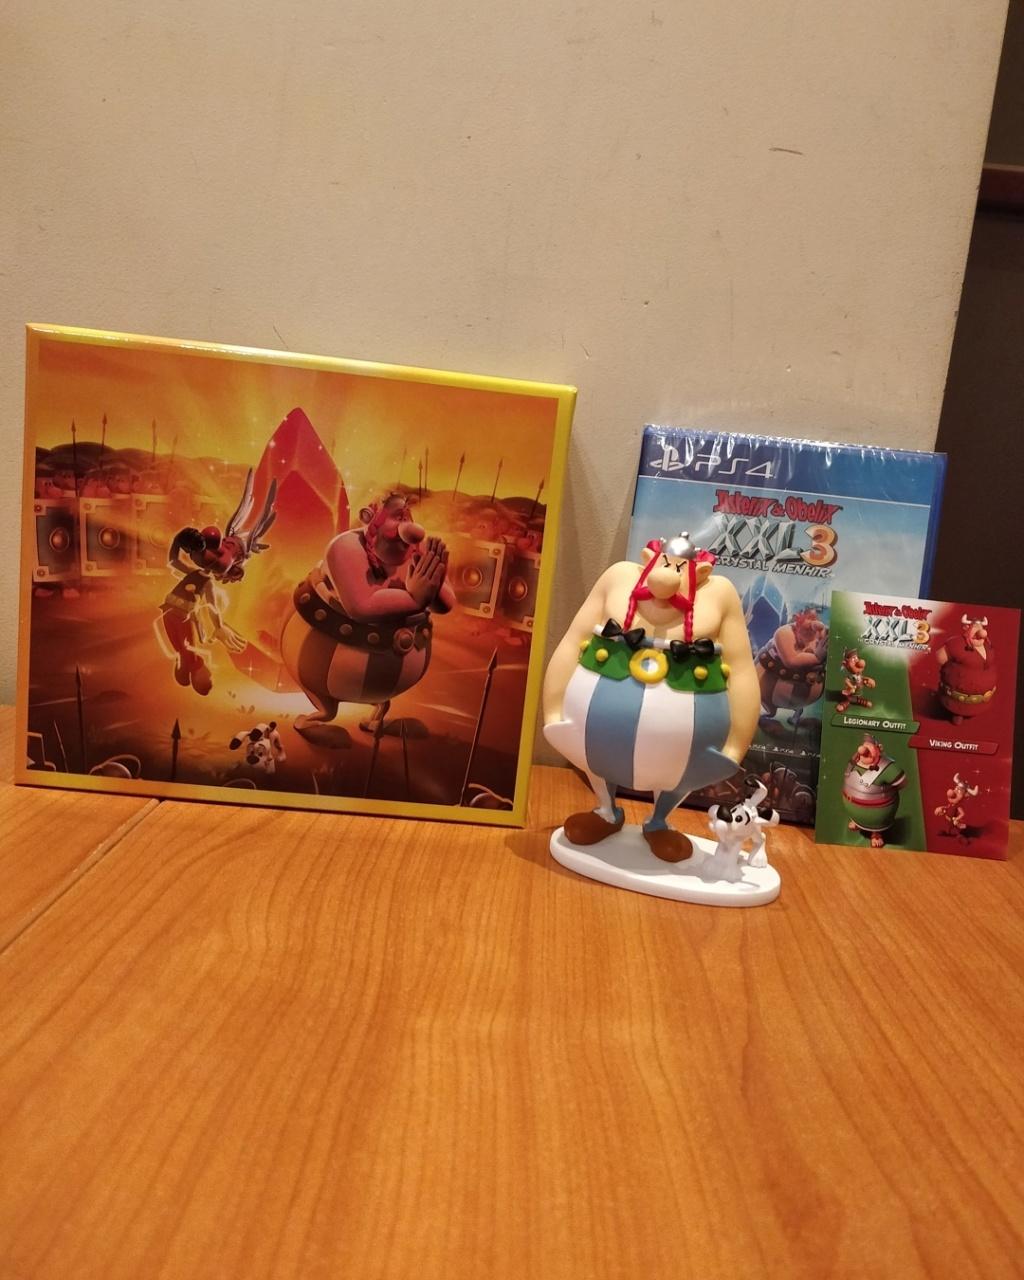 Astérix et Obélix XXL 3 : Le menhir de Cristal Fcc4b610